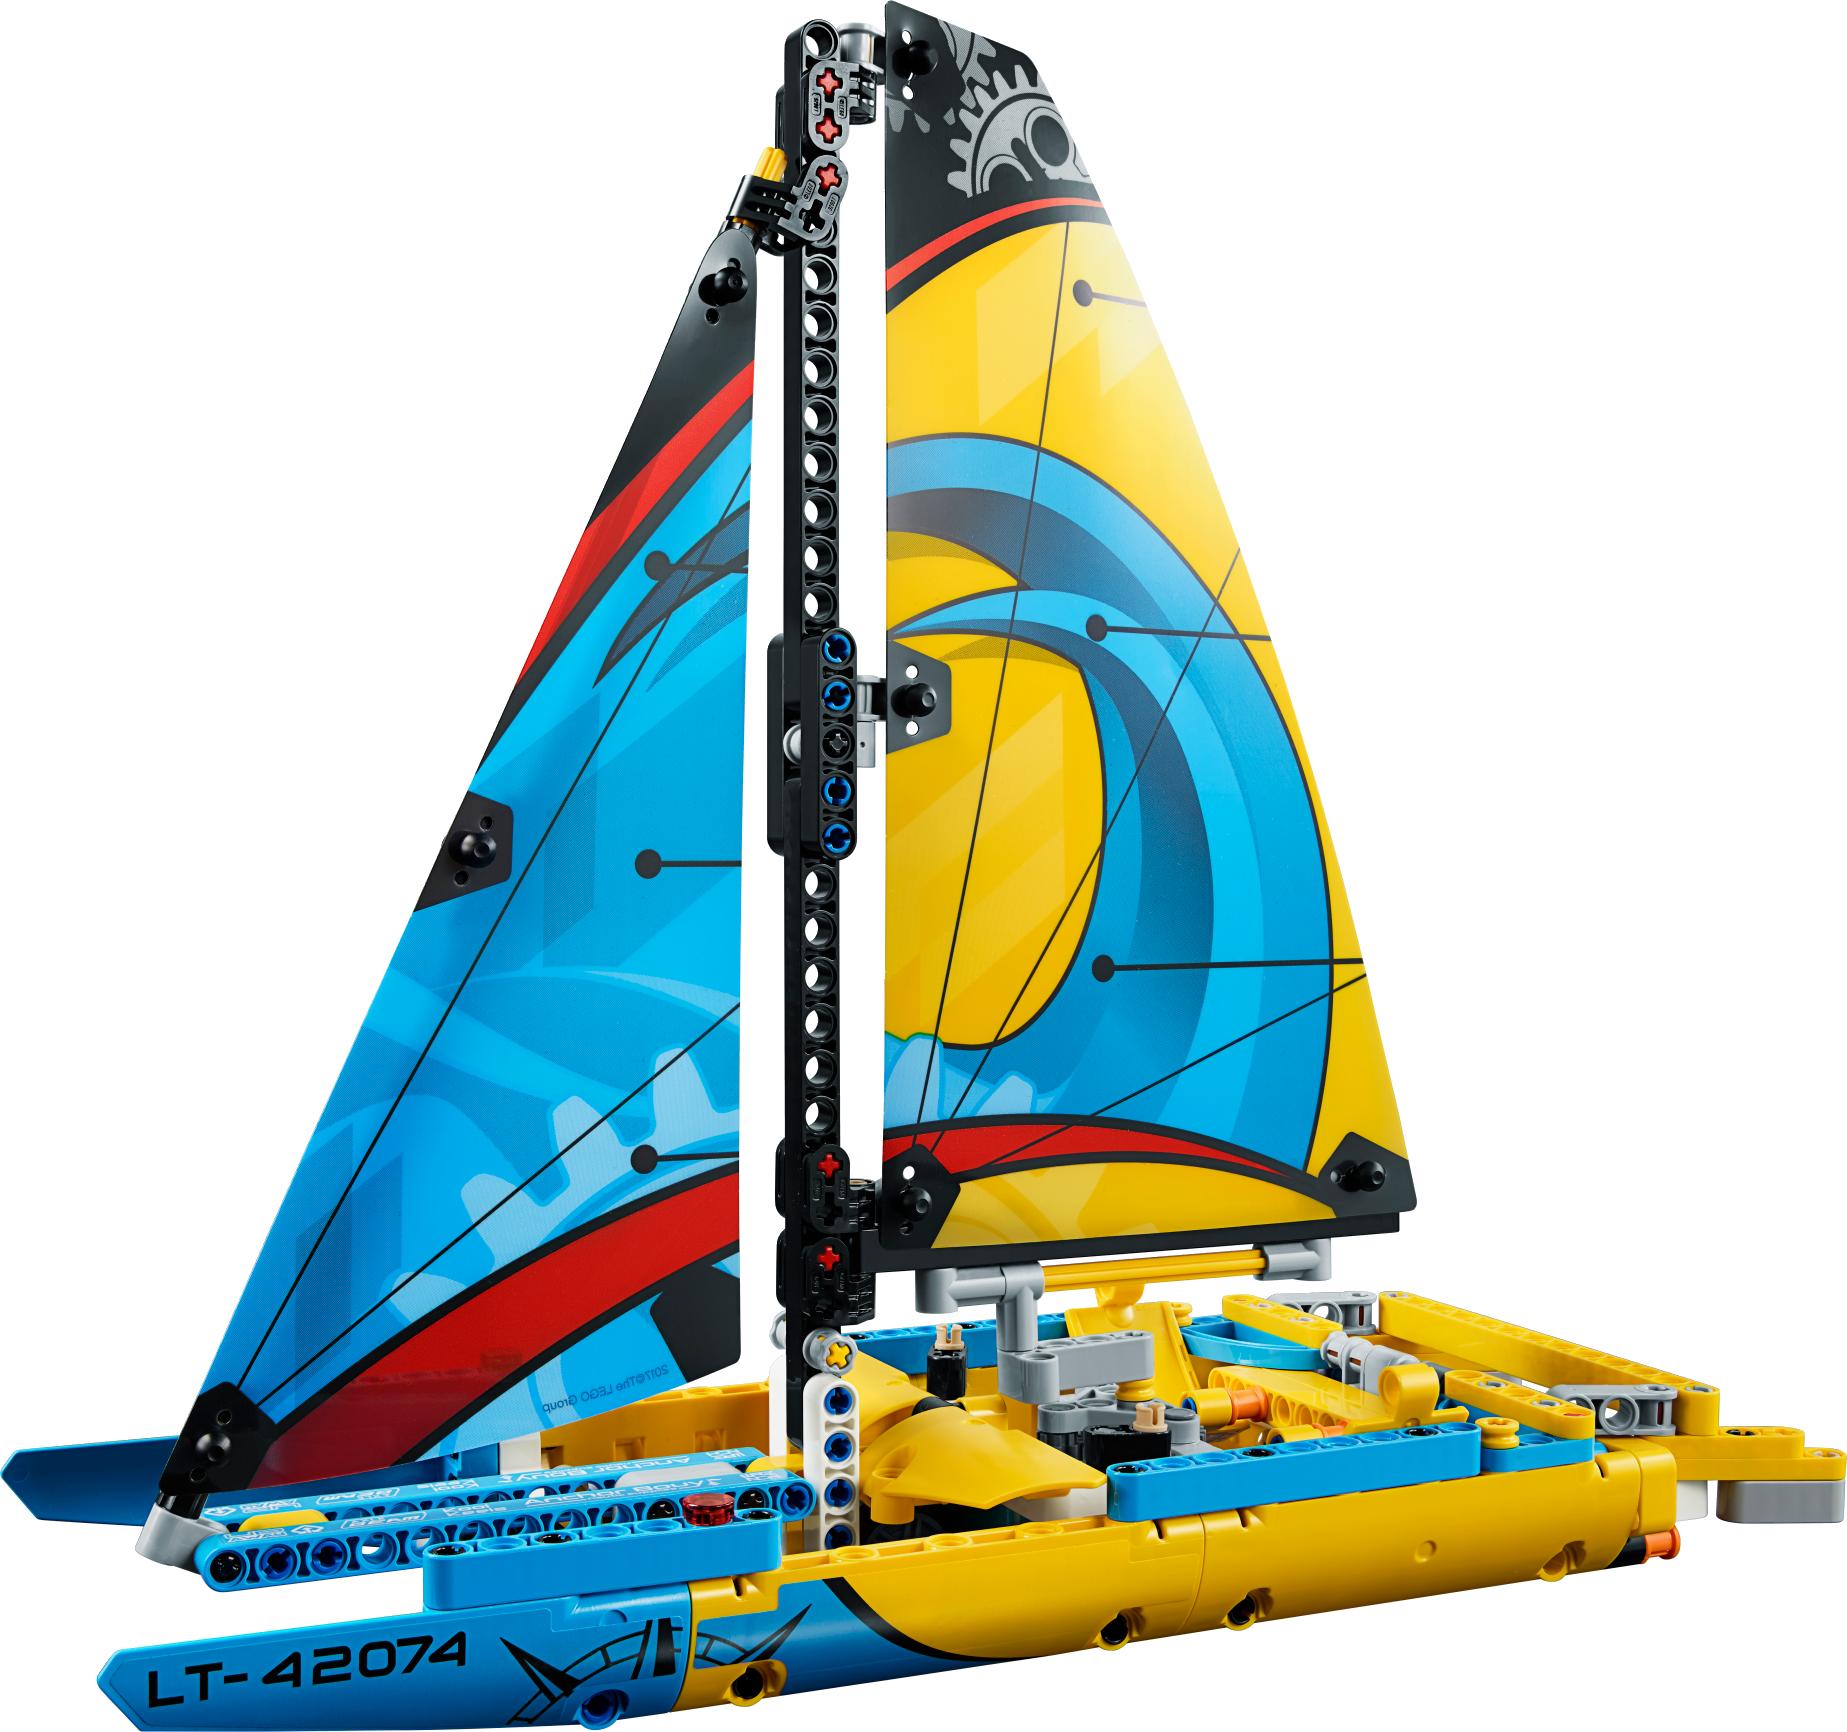 Racing Yacht